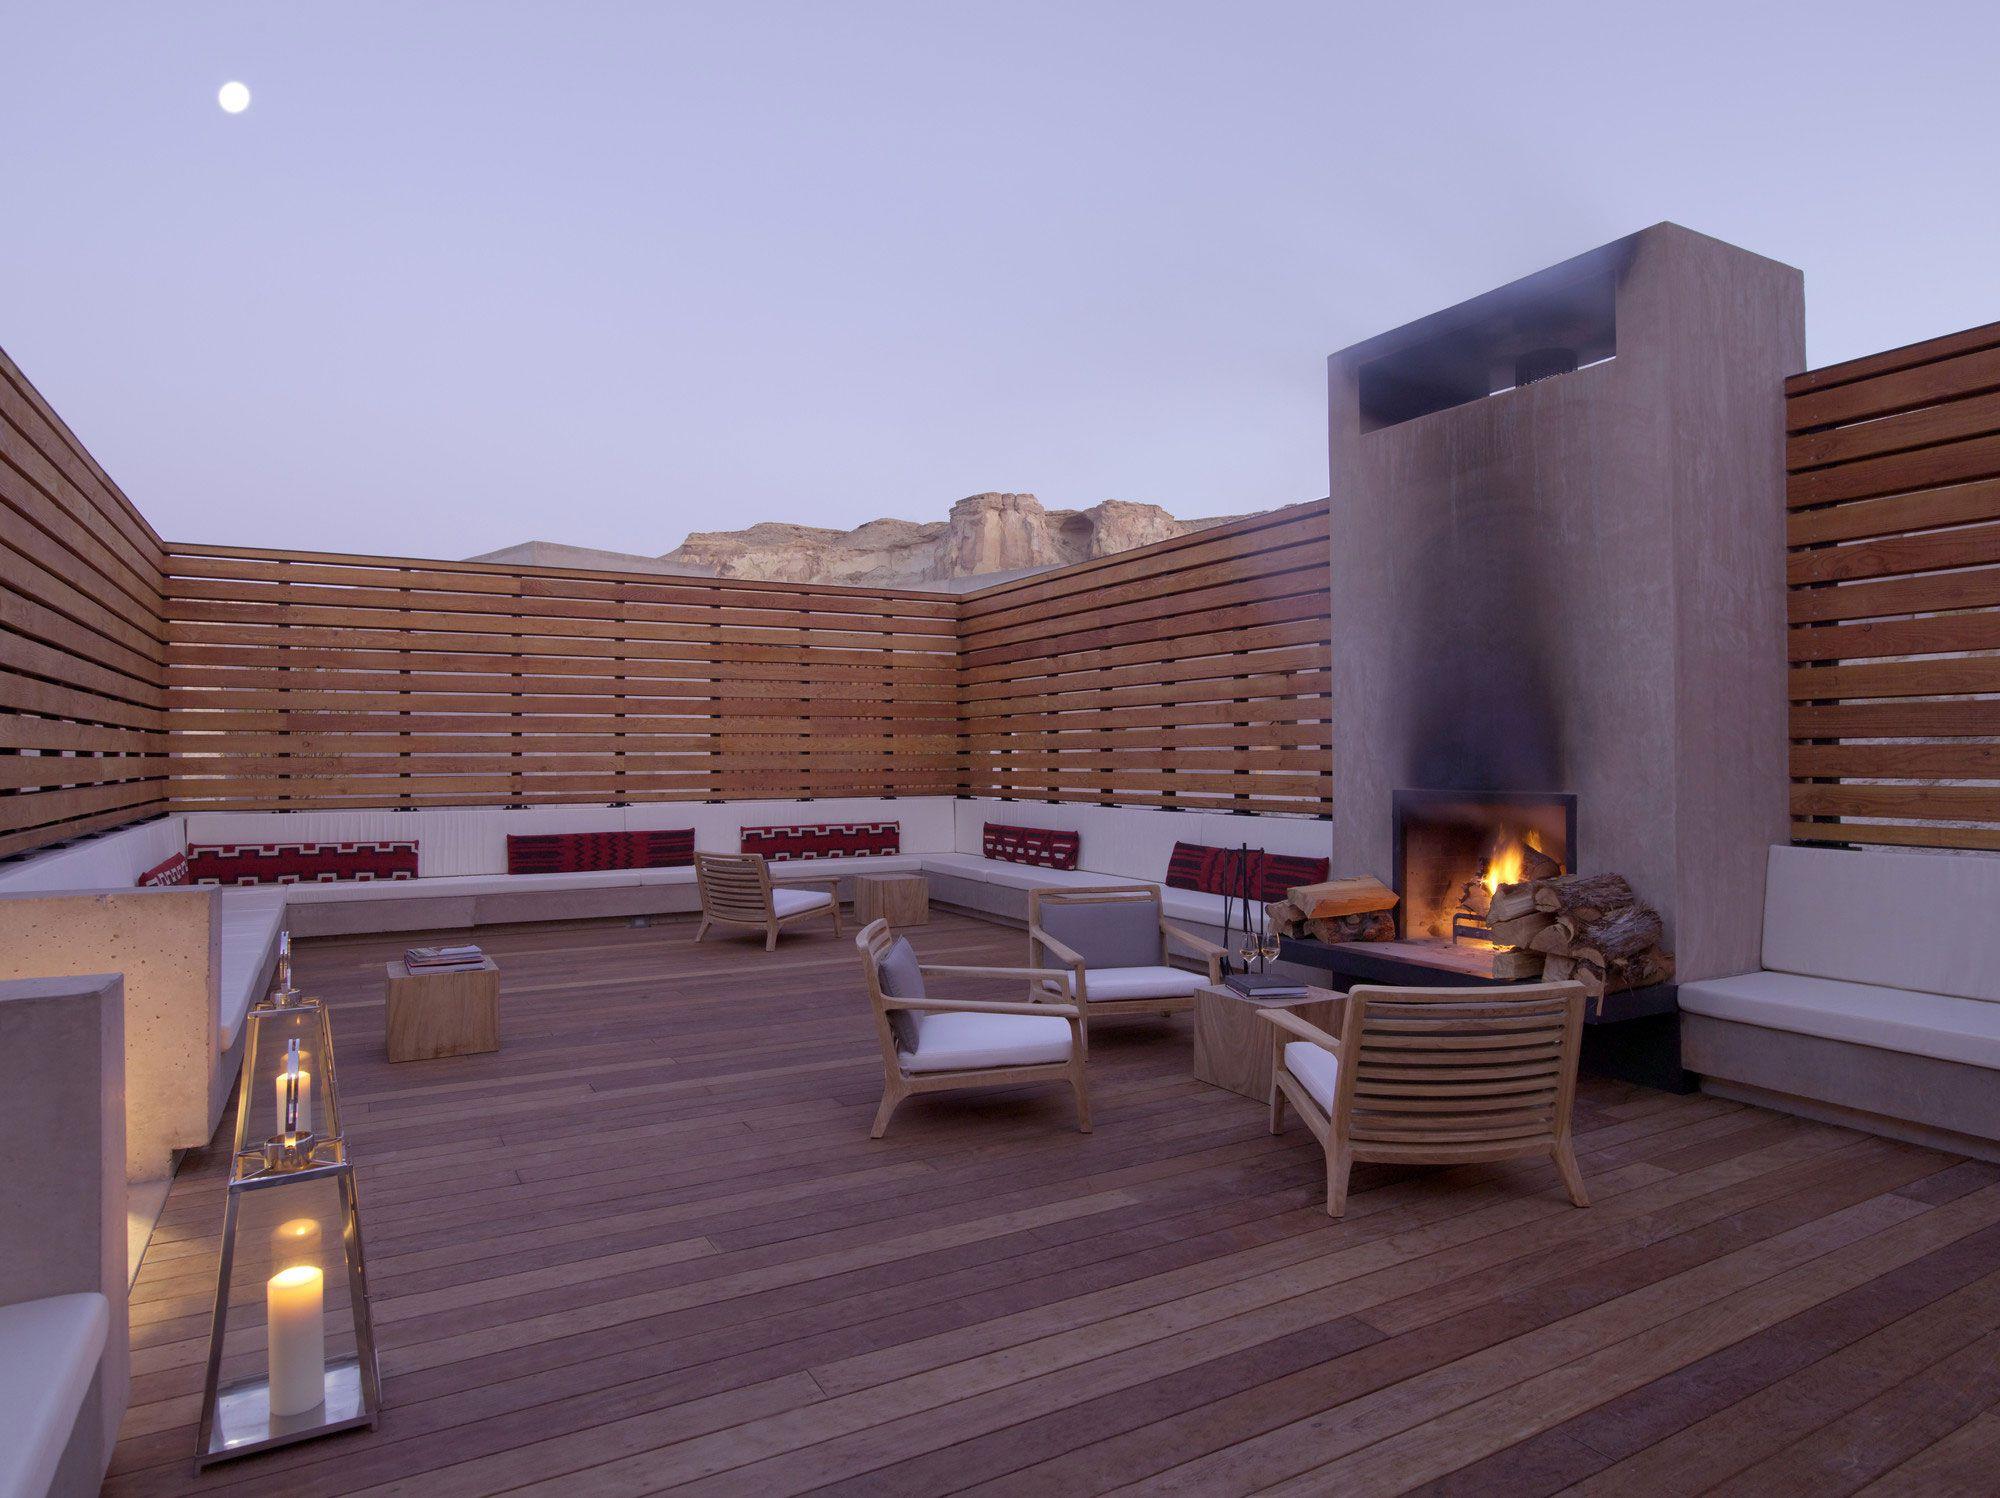 Amangiri-Luxury-Resort-Hotel-in-Canyon-Point-16